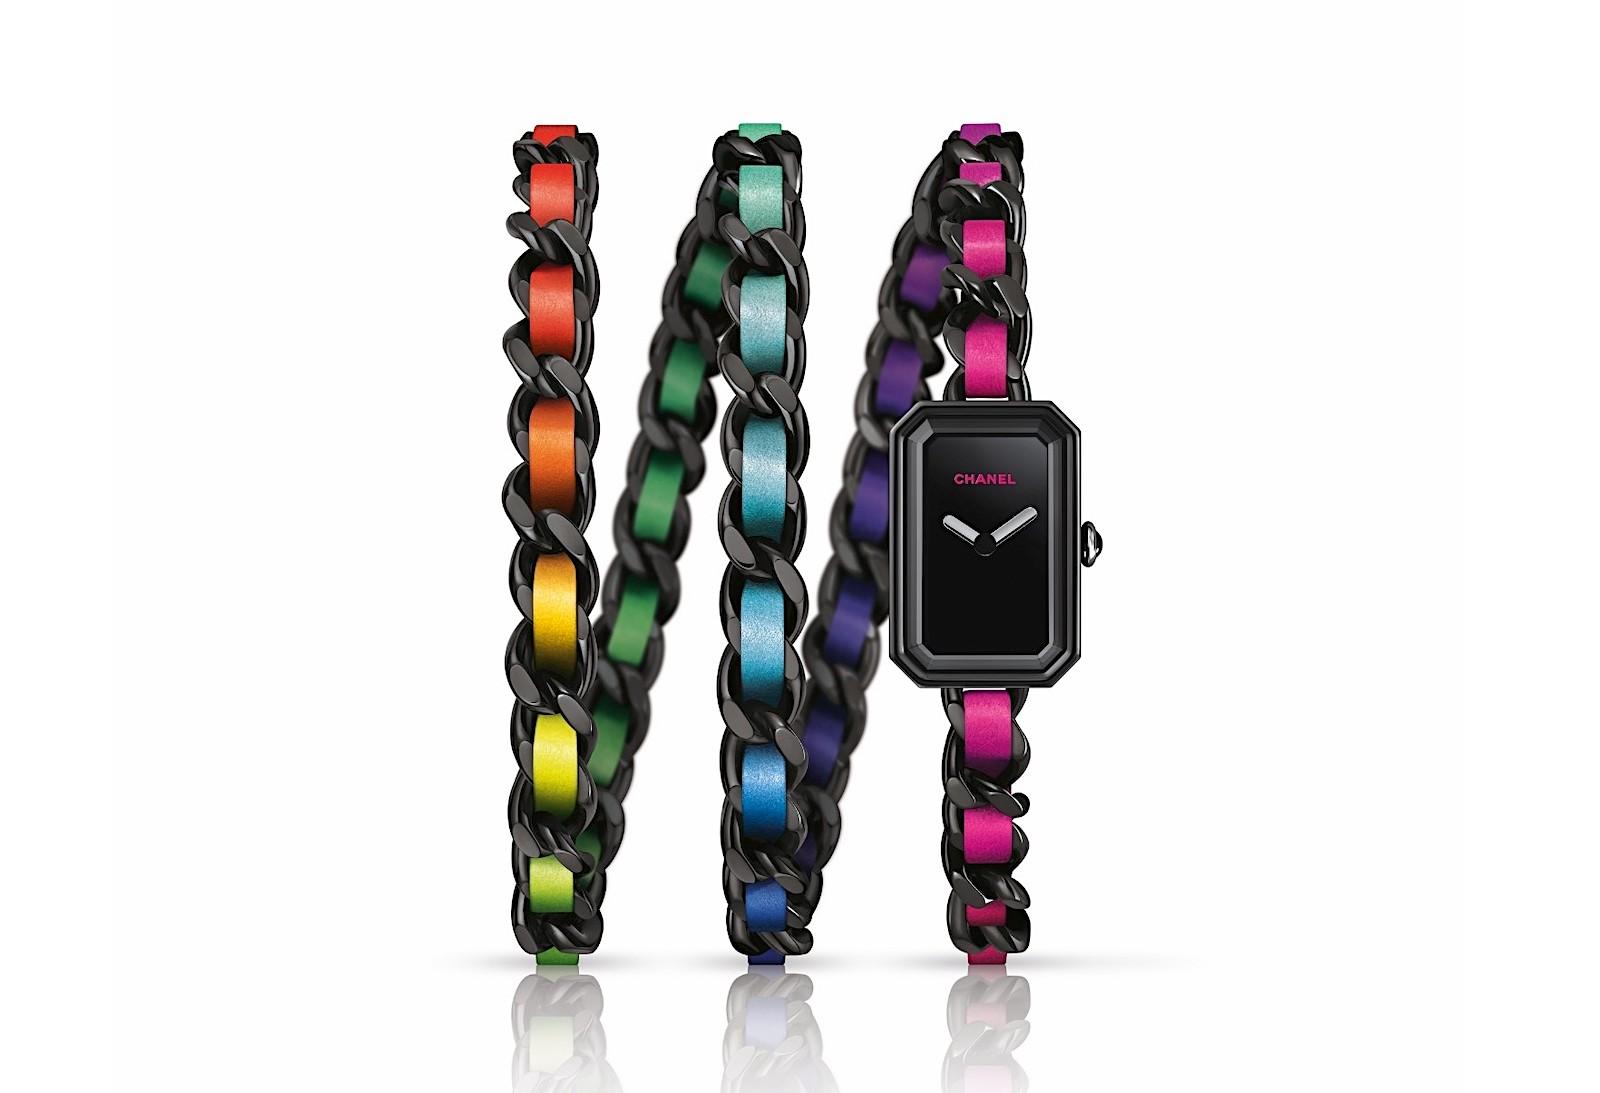 Chanel en Watches and Wonders 2021 - Premiere Electro 2.jpg